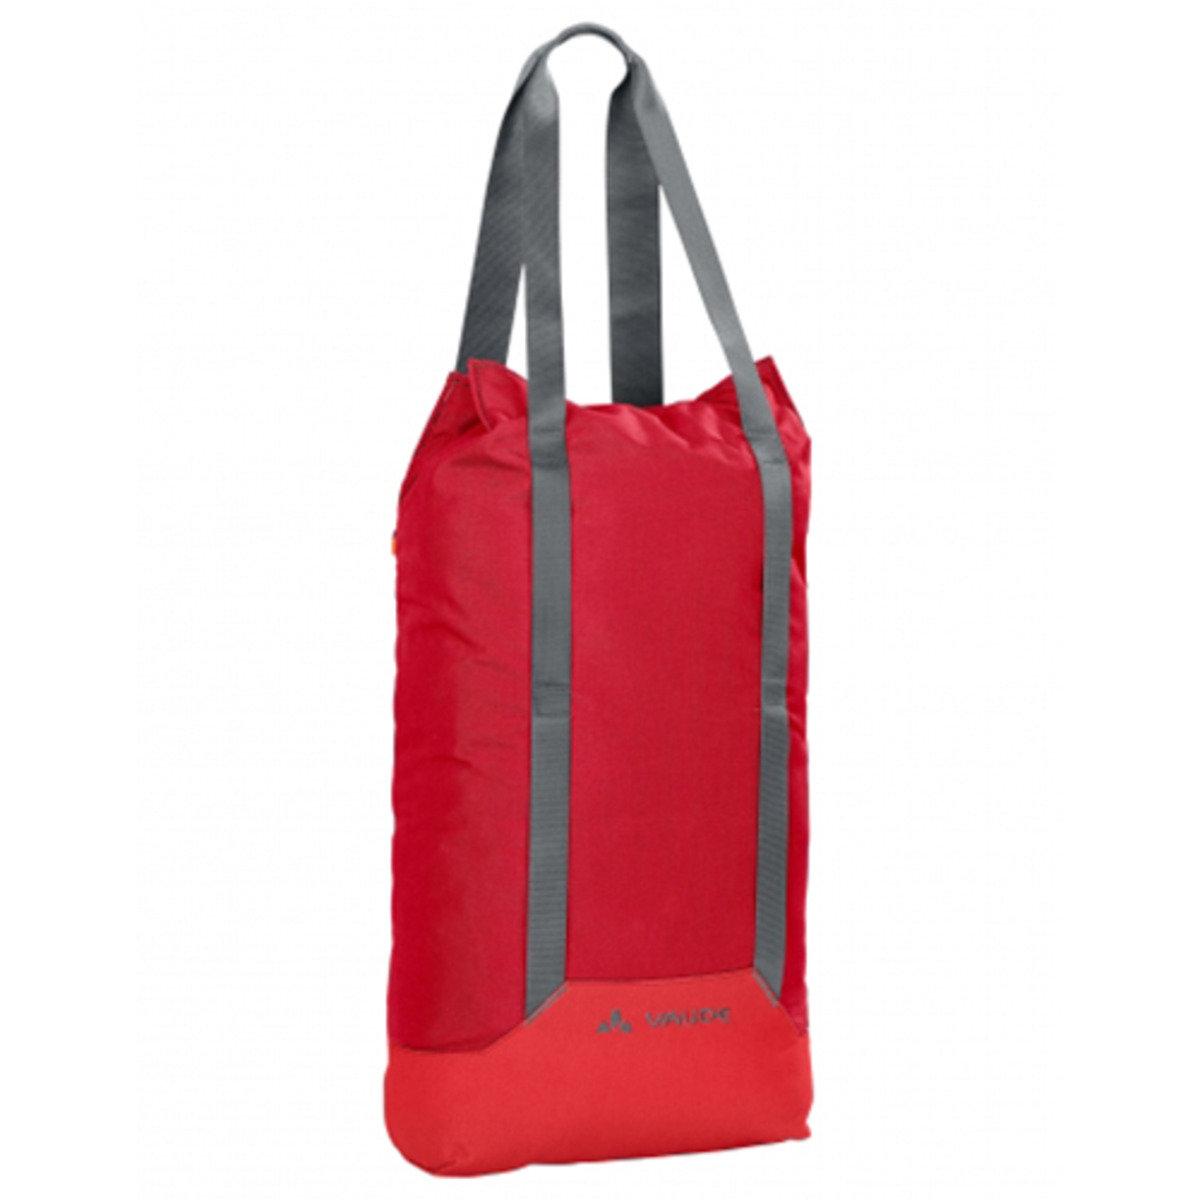 Counterpart-Red 肩揹  / 背包兩用袋